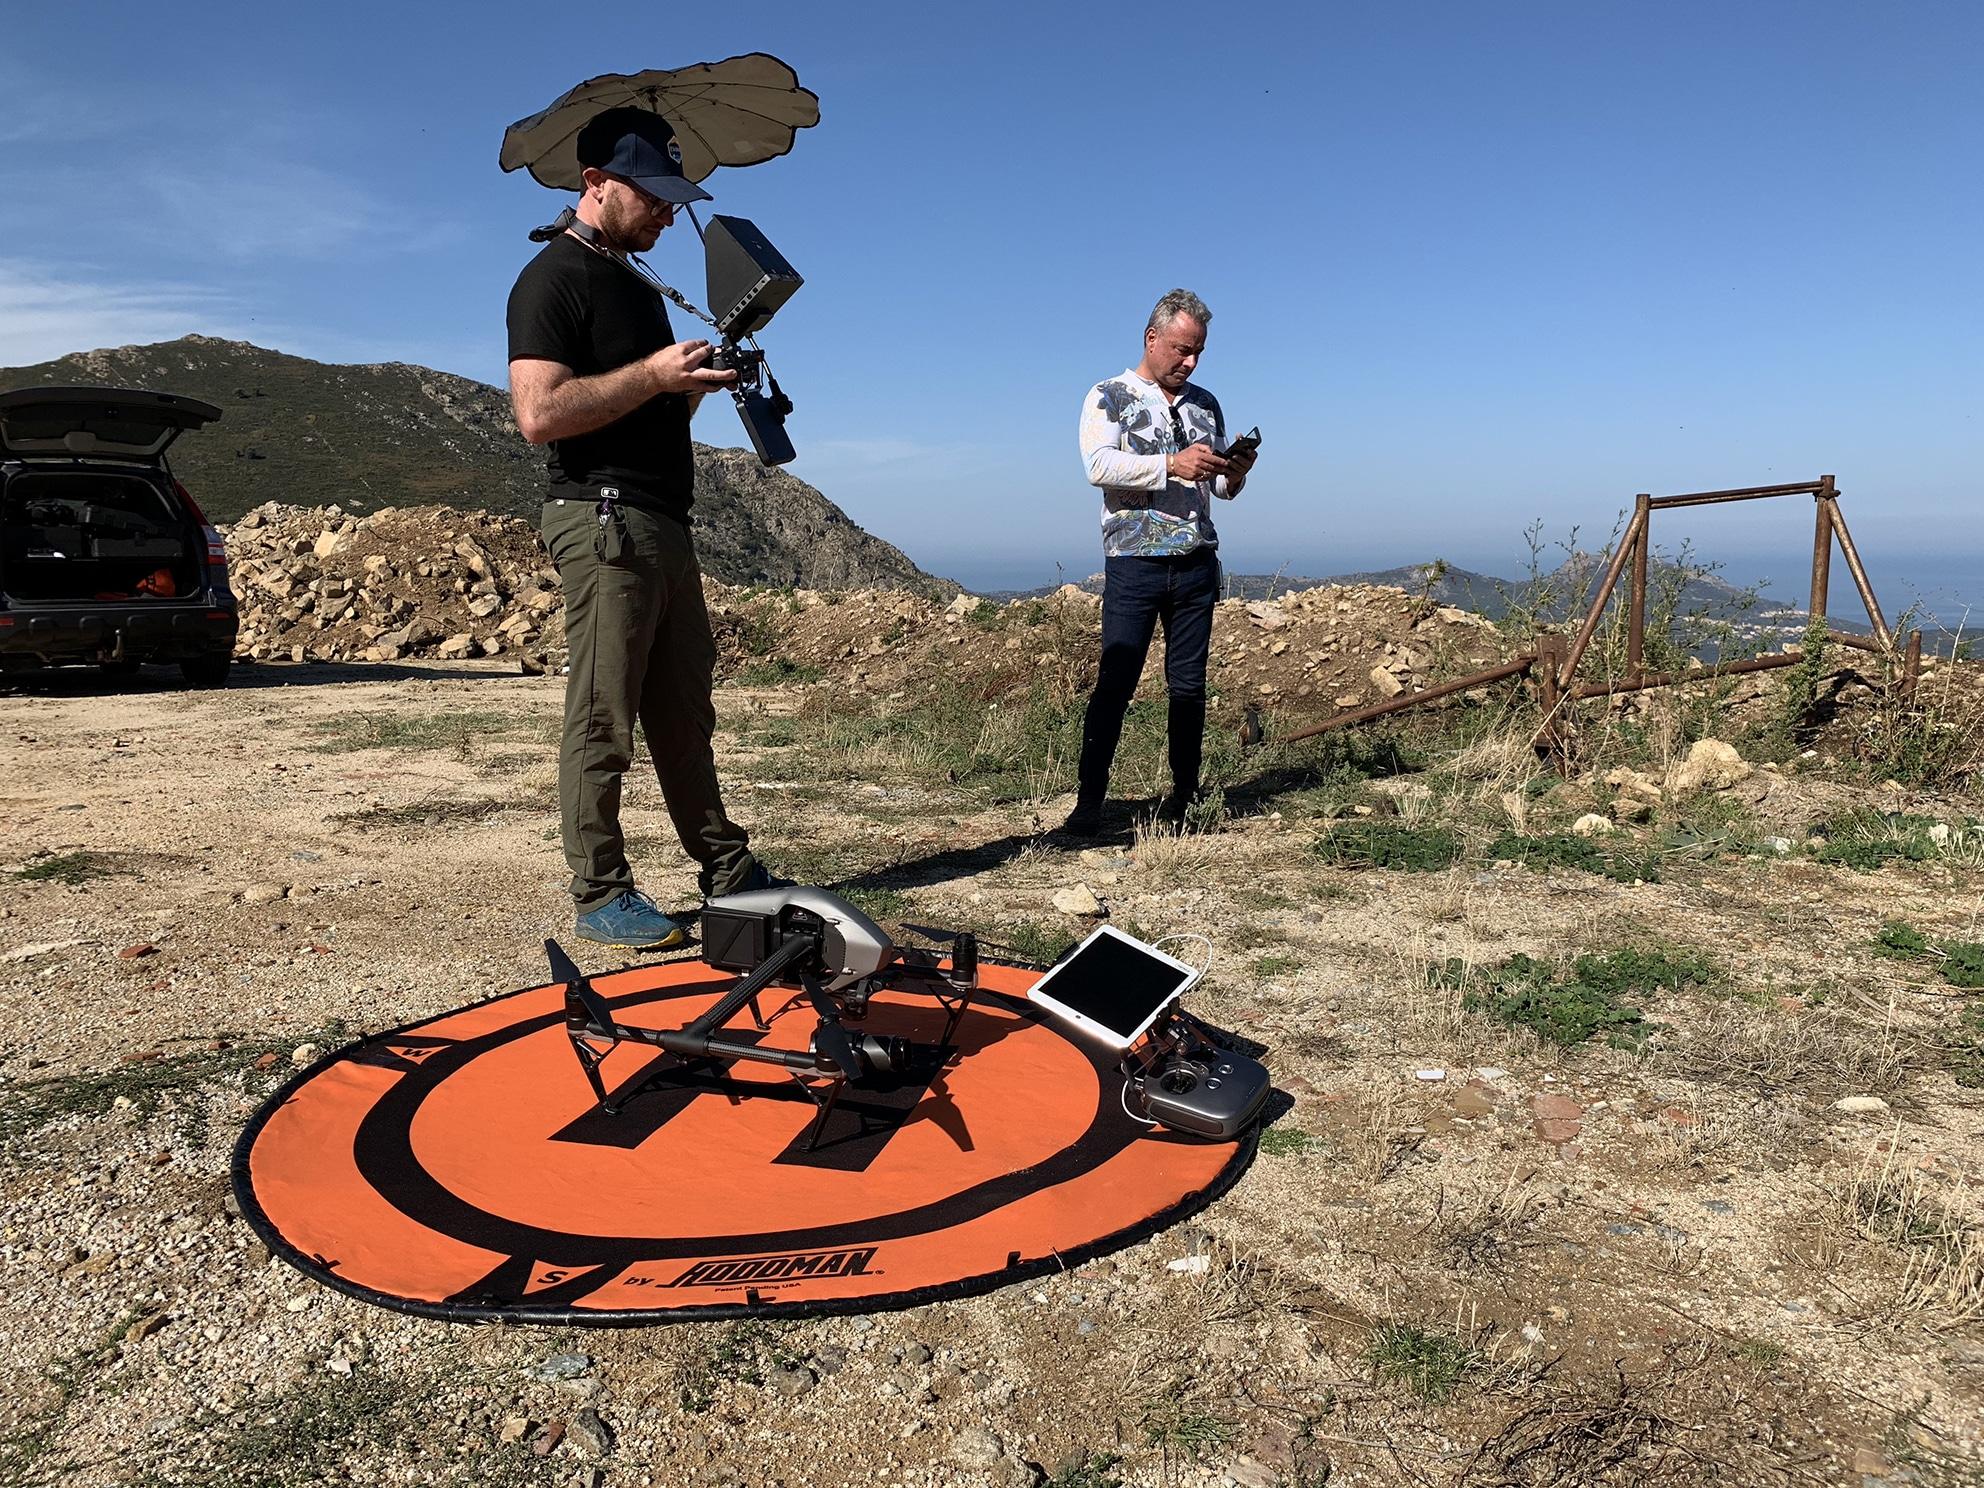 Tournage-Speloncato-Drone-2